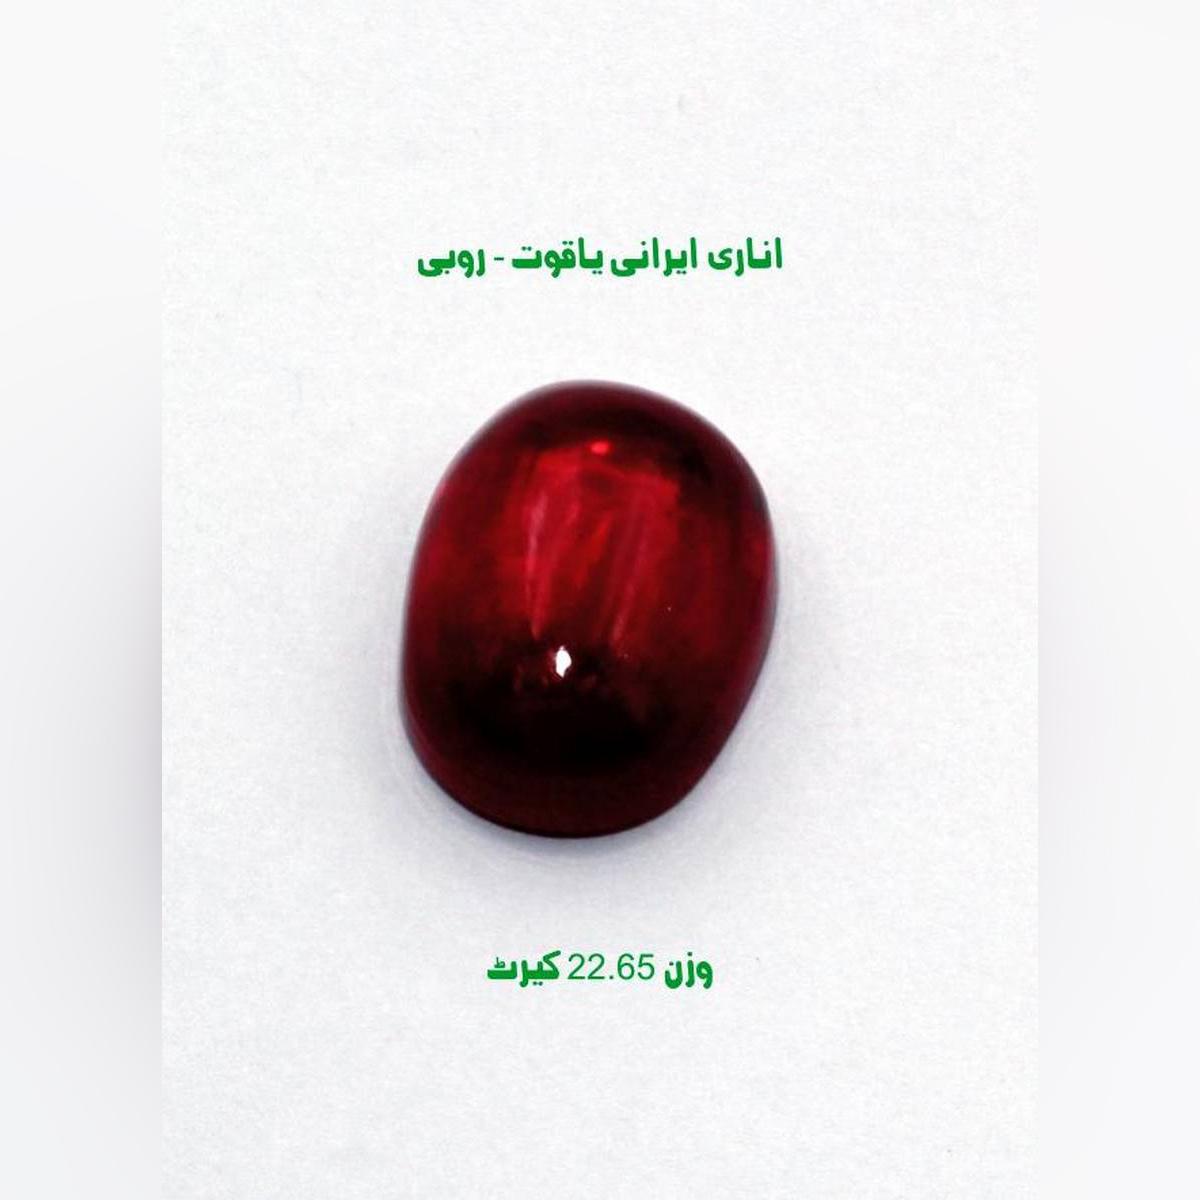 Anari Yaqoot - Ruby Irani Gemstone Weight 22.65 Carat